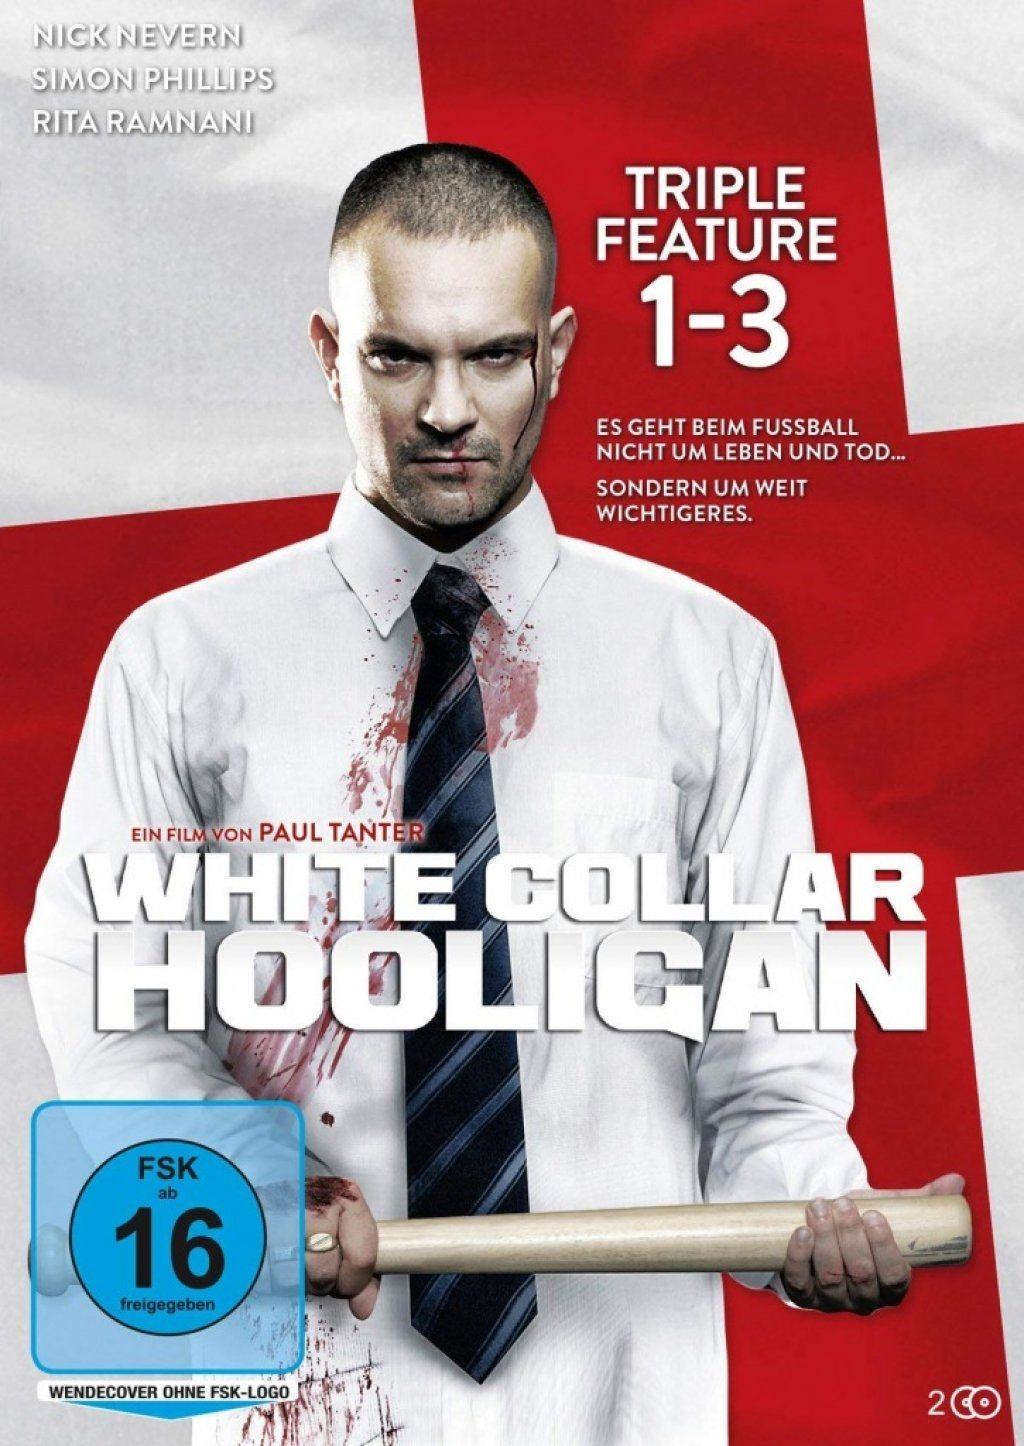 White Collar Hooligan 1-3 Tripple Feature (2 Discs)